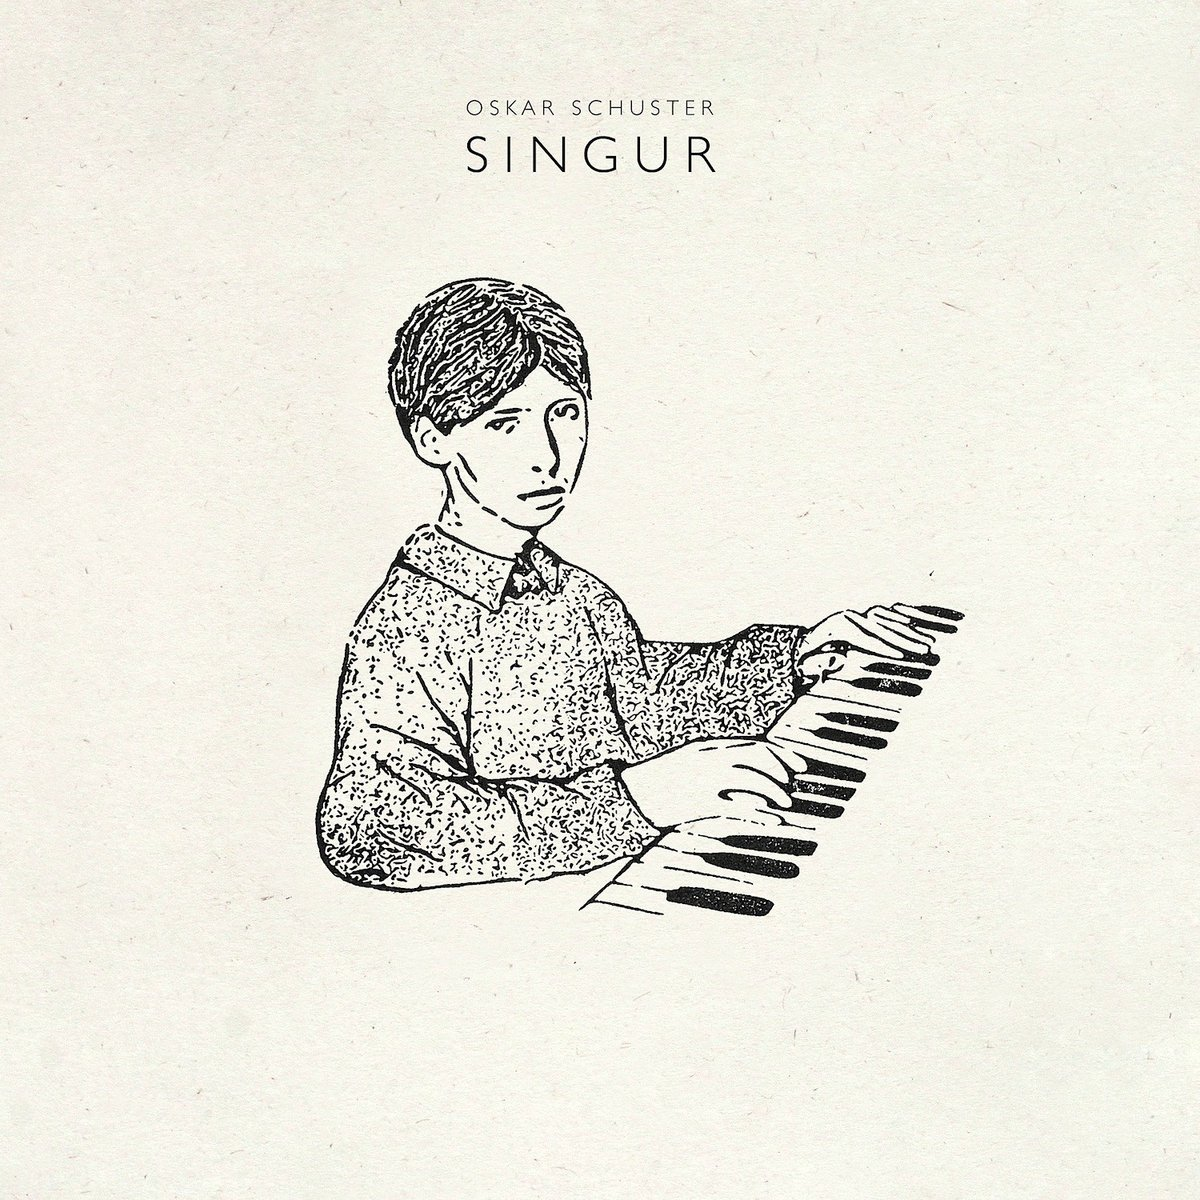 Oskar Schuster - Singur (2016)